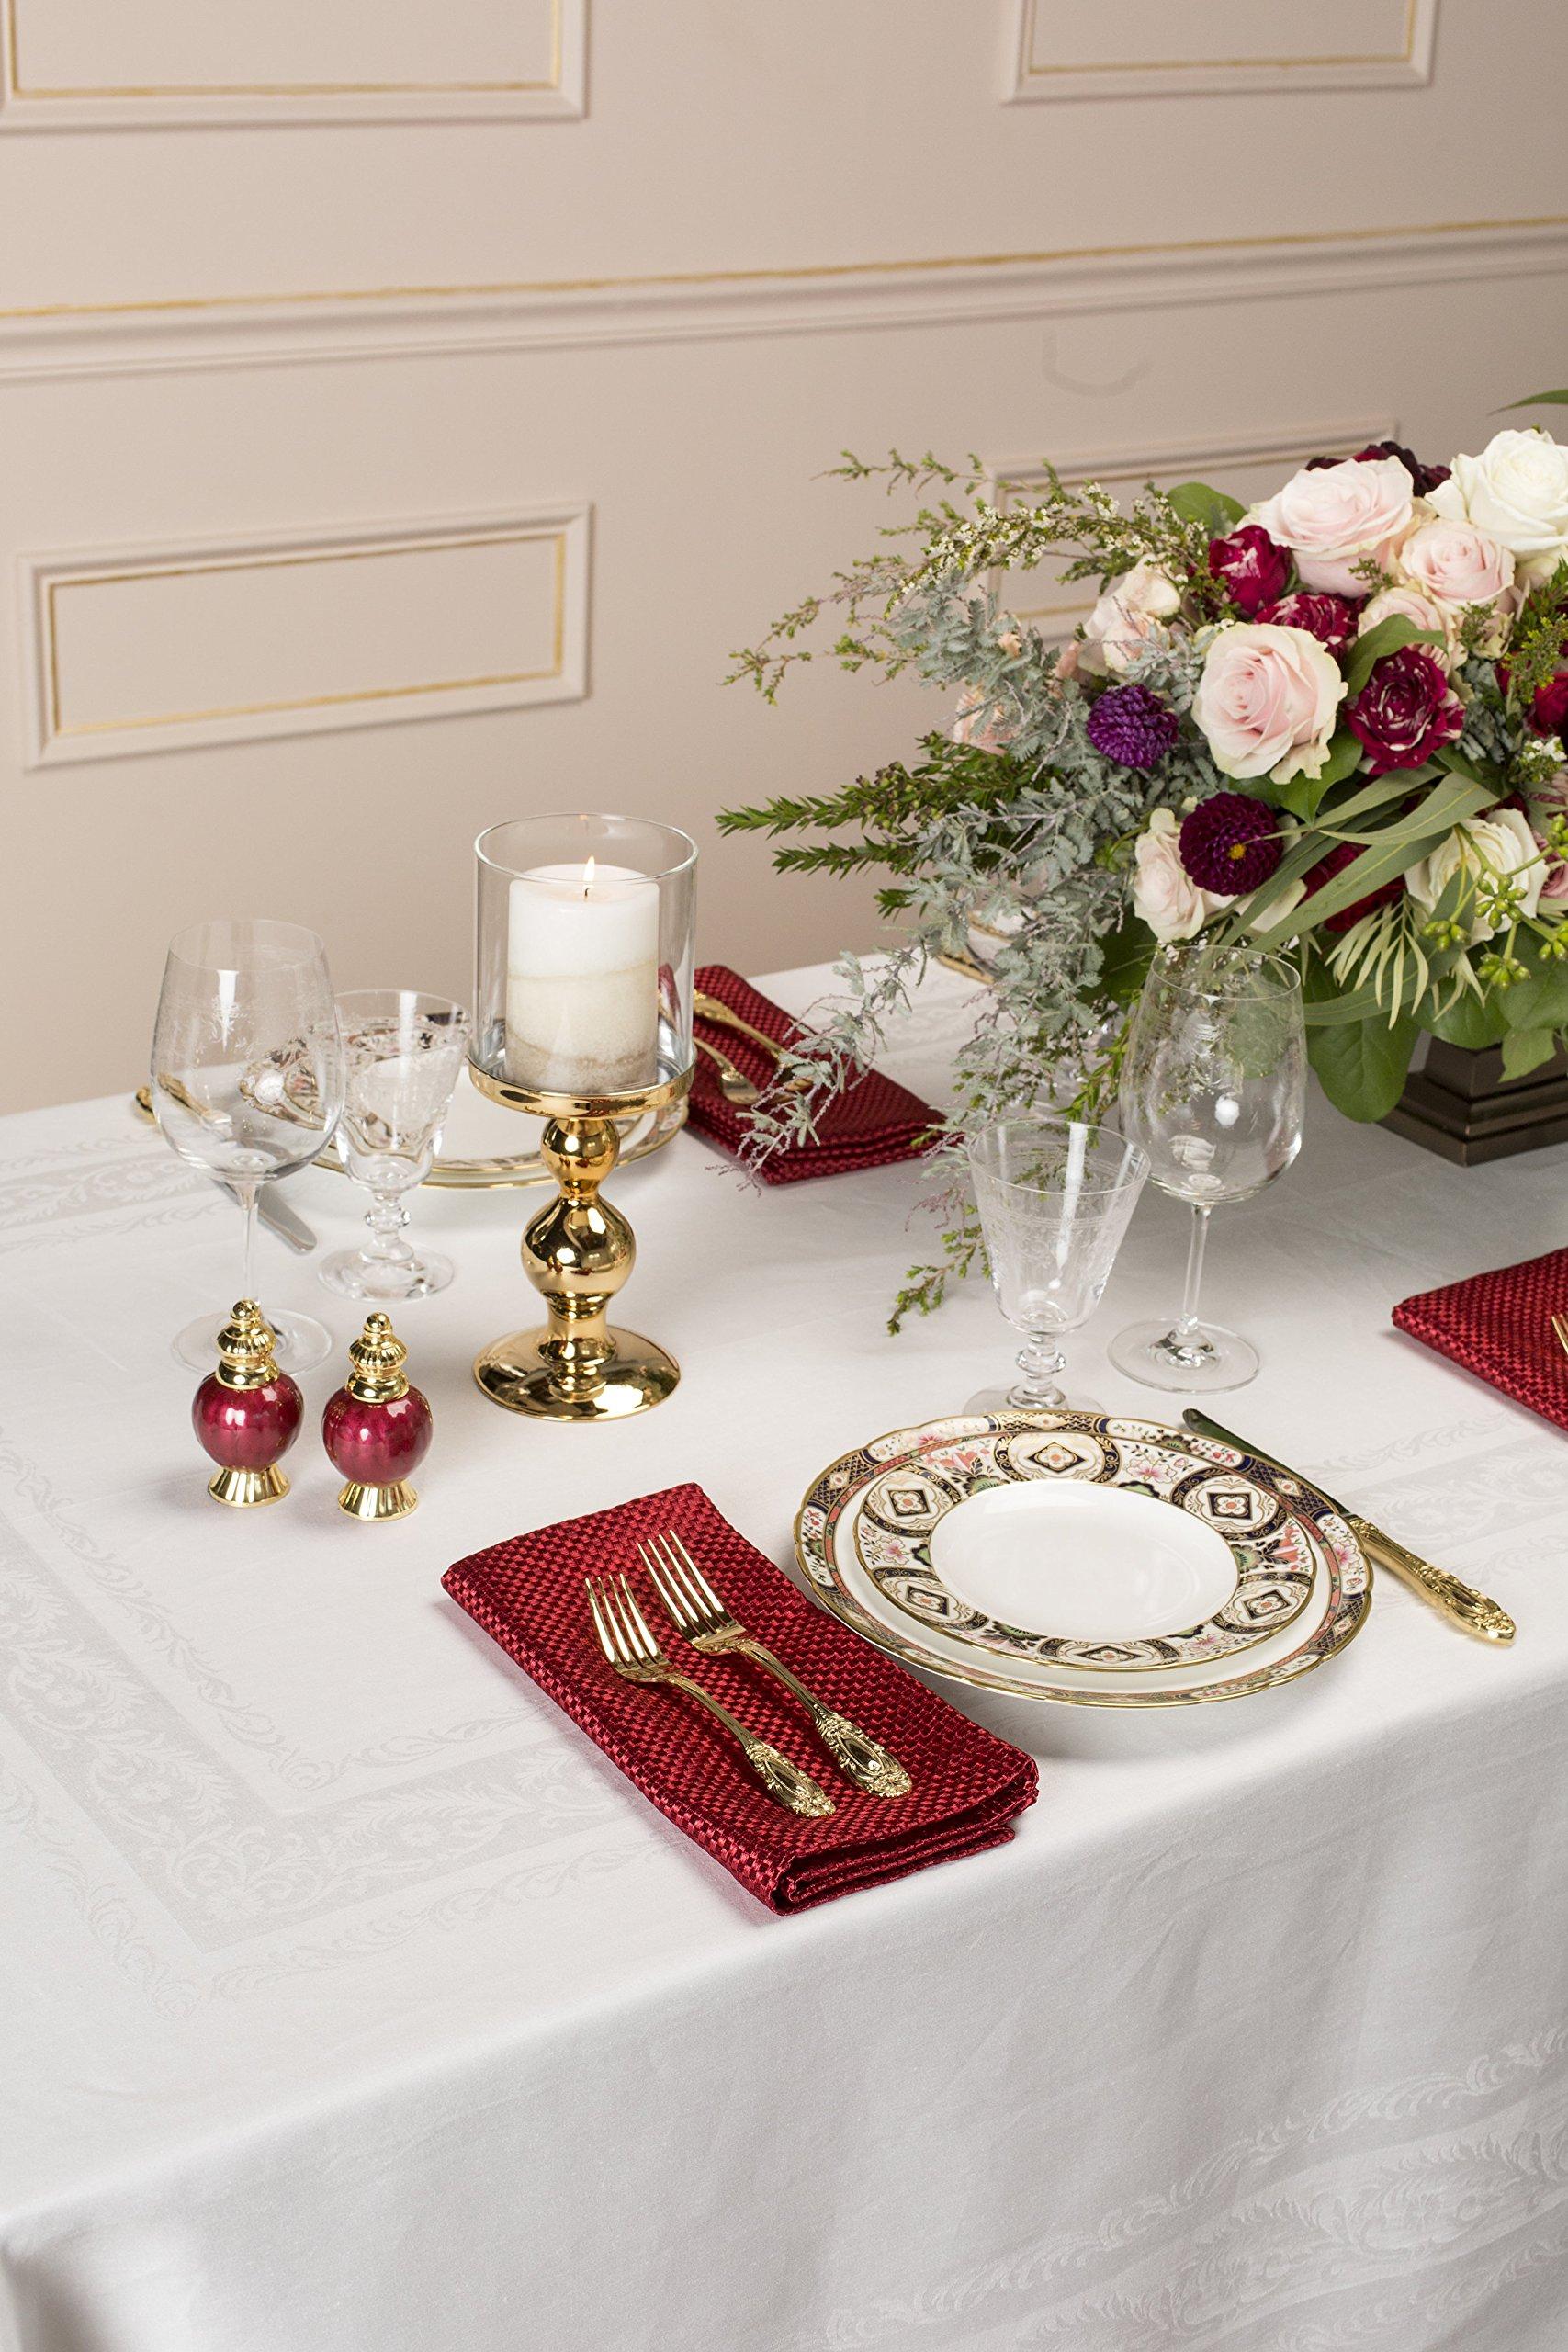 Thomas Ferguson Fine Scroll White Linen Double Damask Rectangular Tablecloth 72in x 126in (83cm x 320cm)